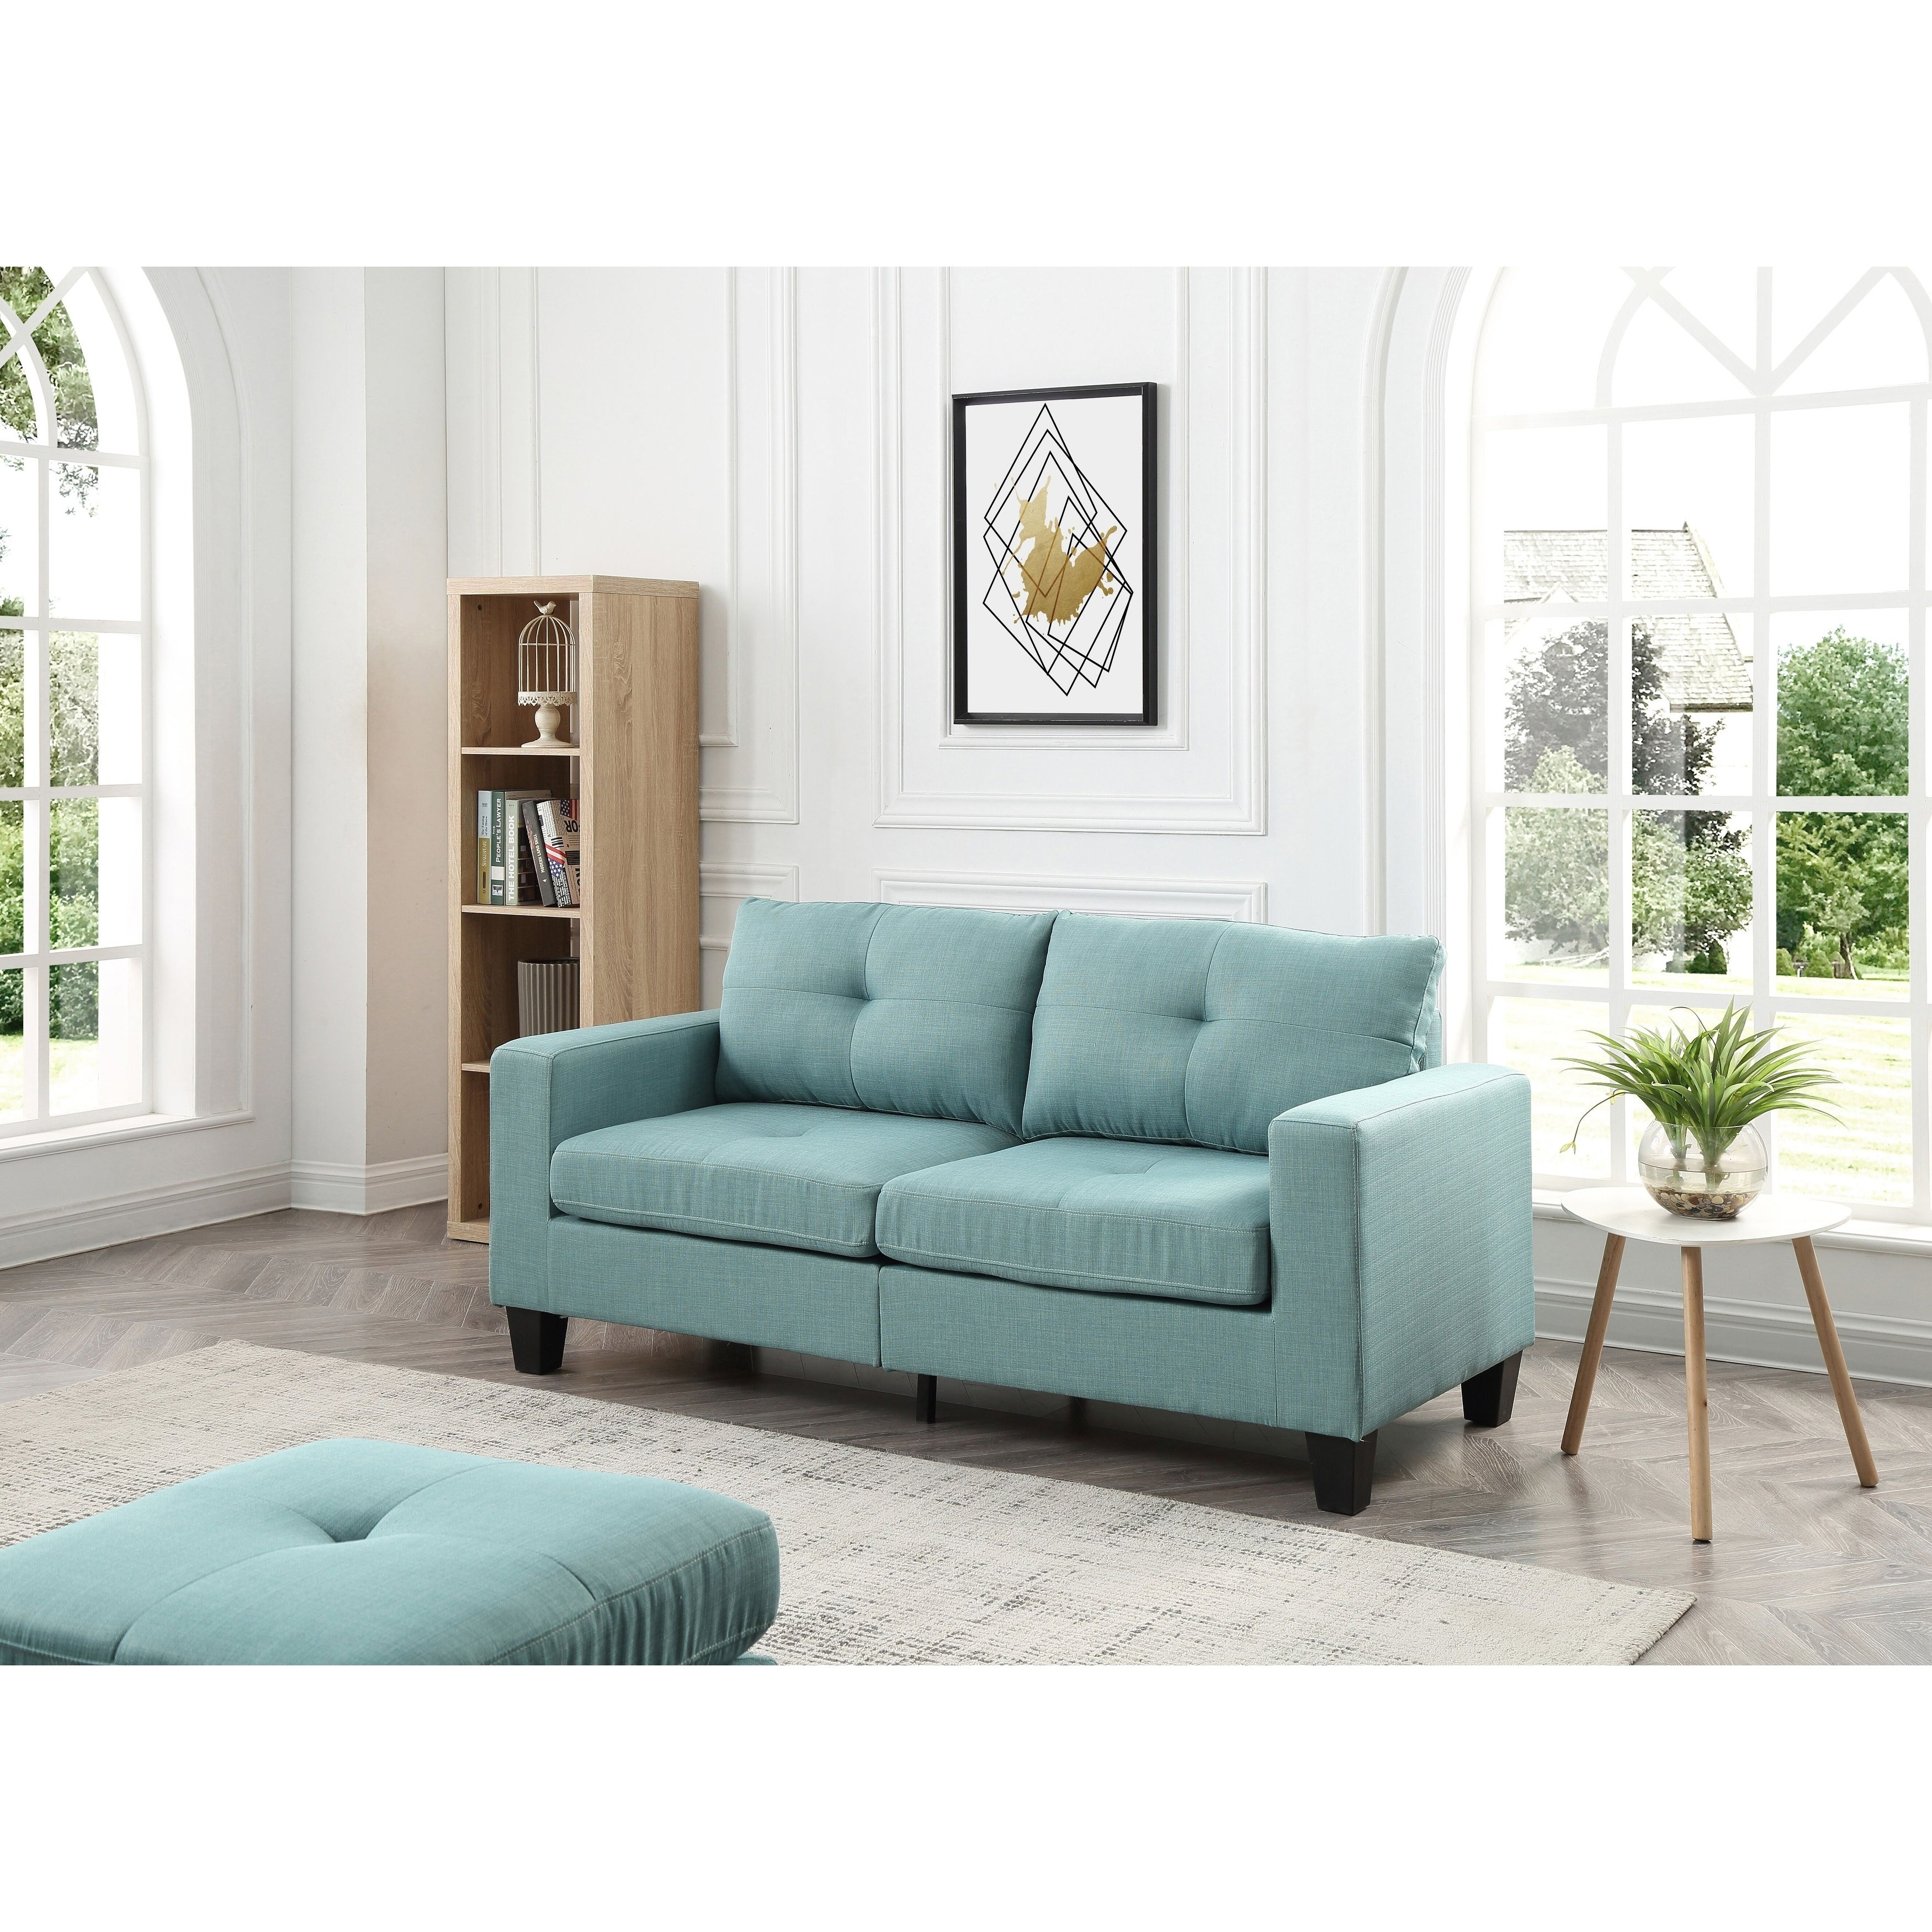 Newbury Modular Fabric Living Room Sofa